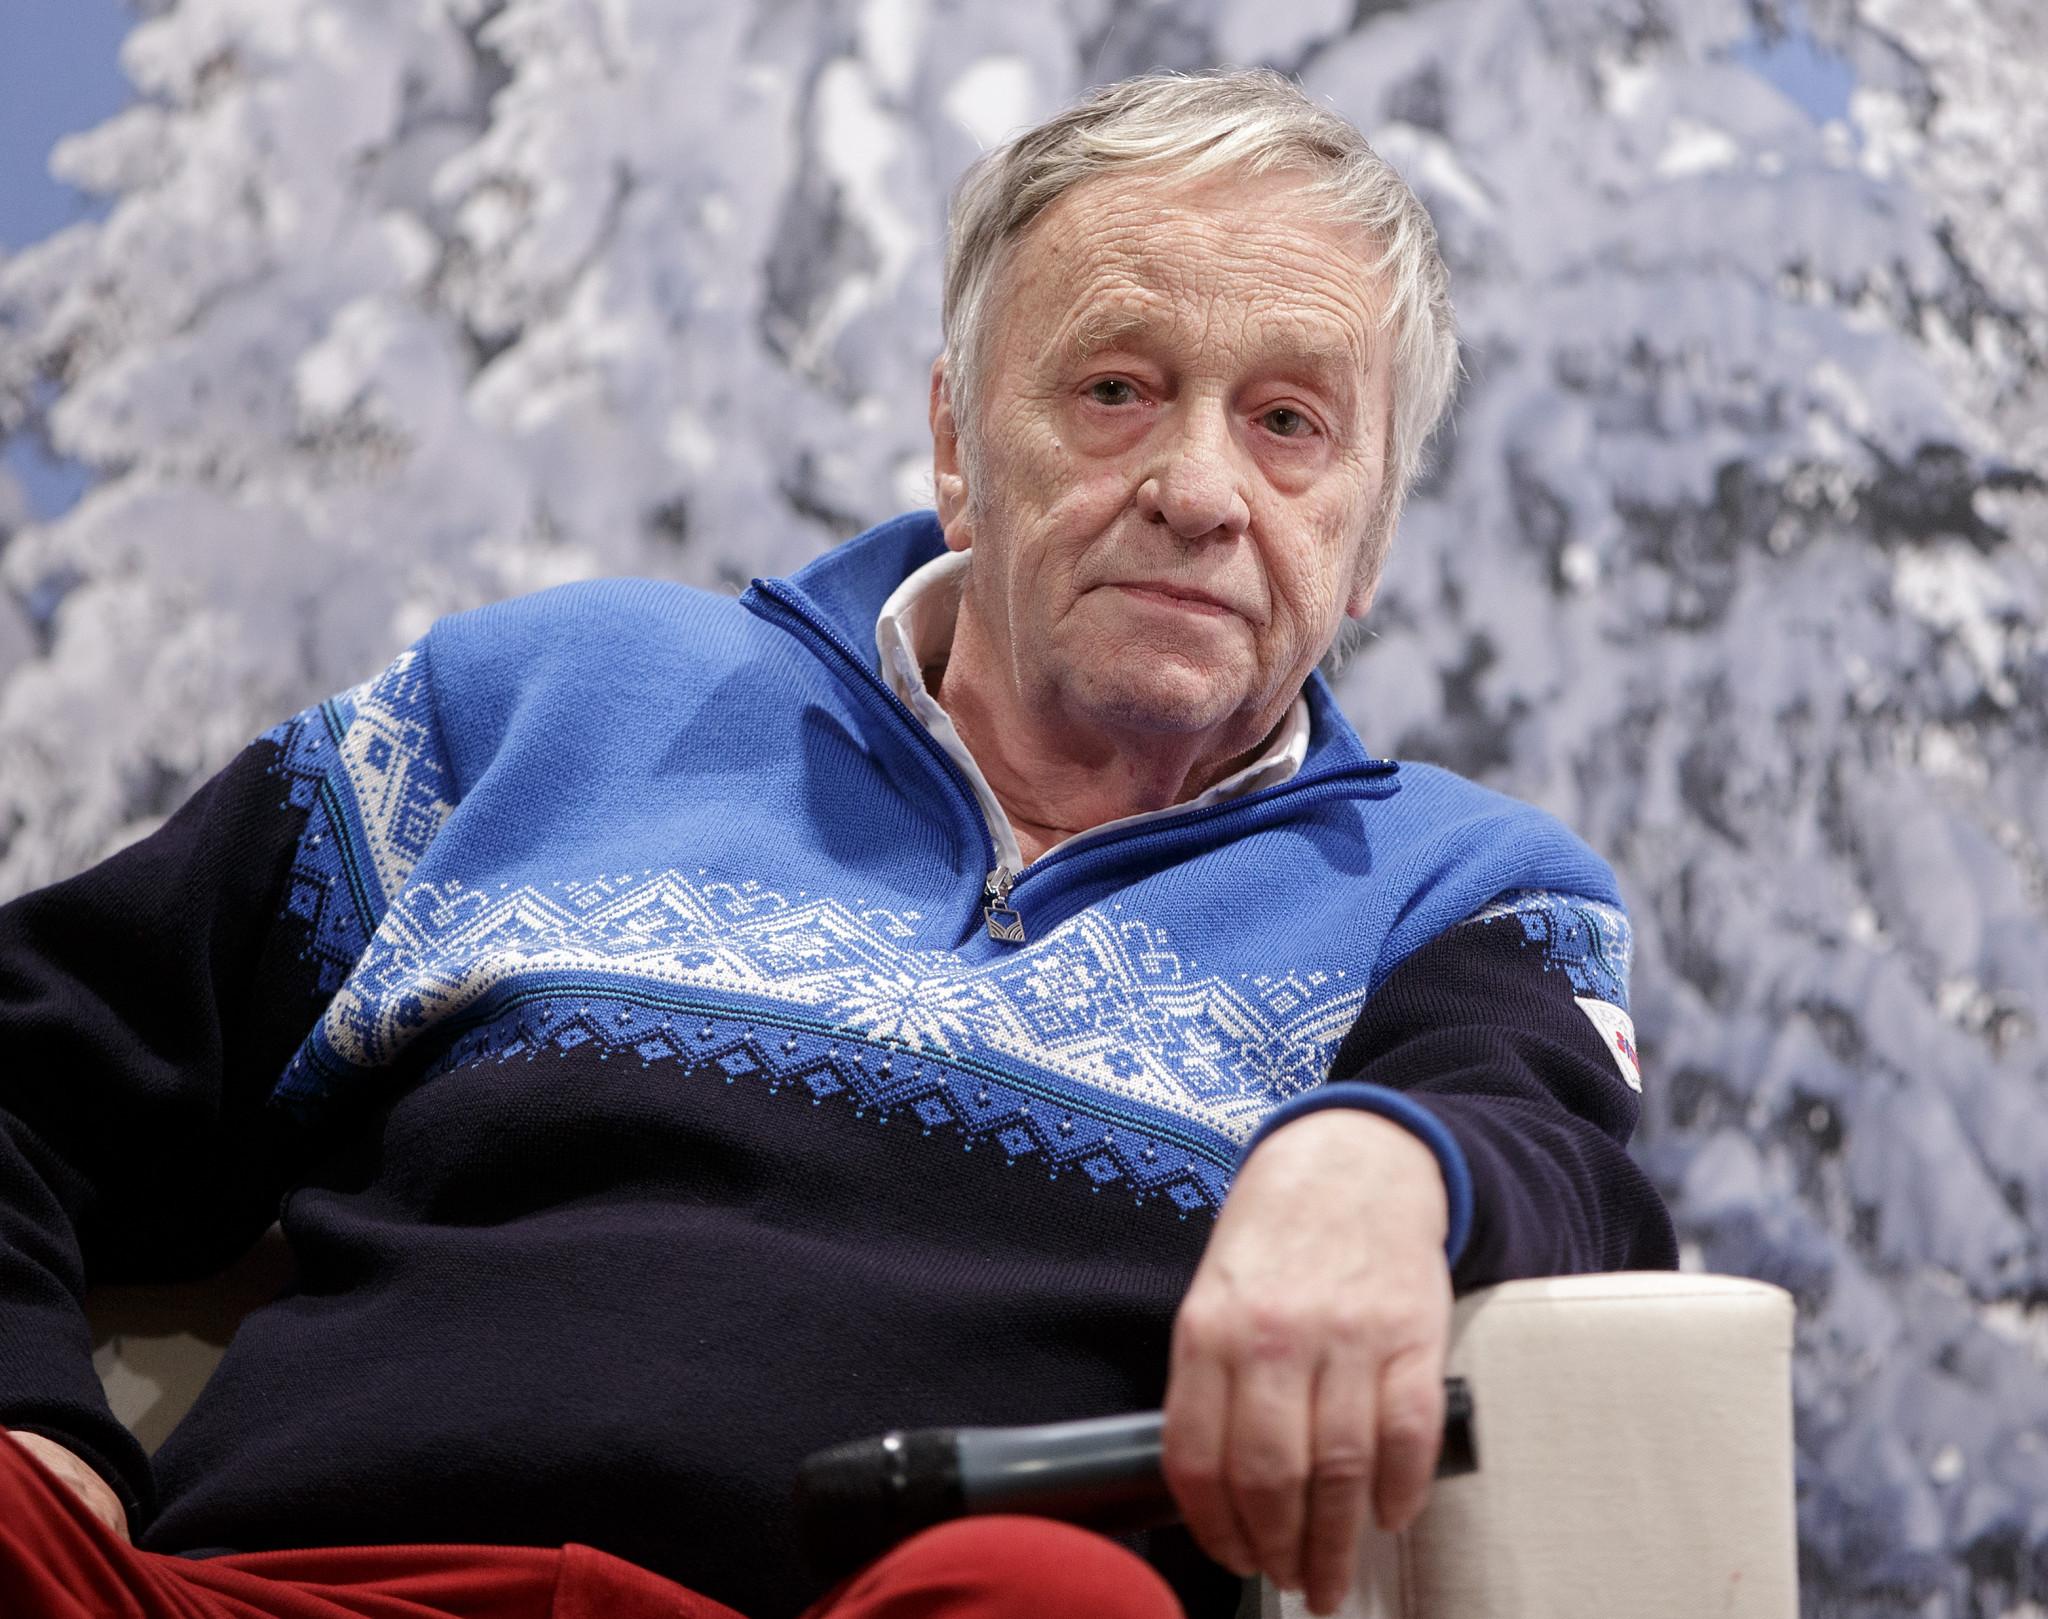 Kasper announces intention to seek sixth term as International Ski Federation President